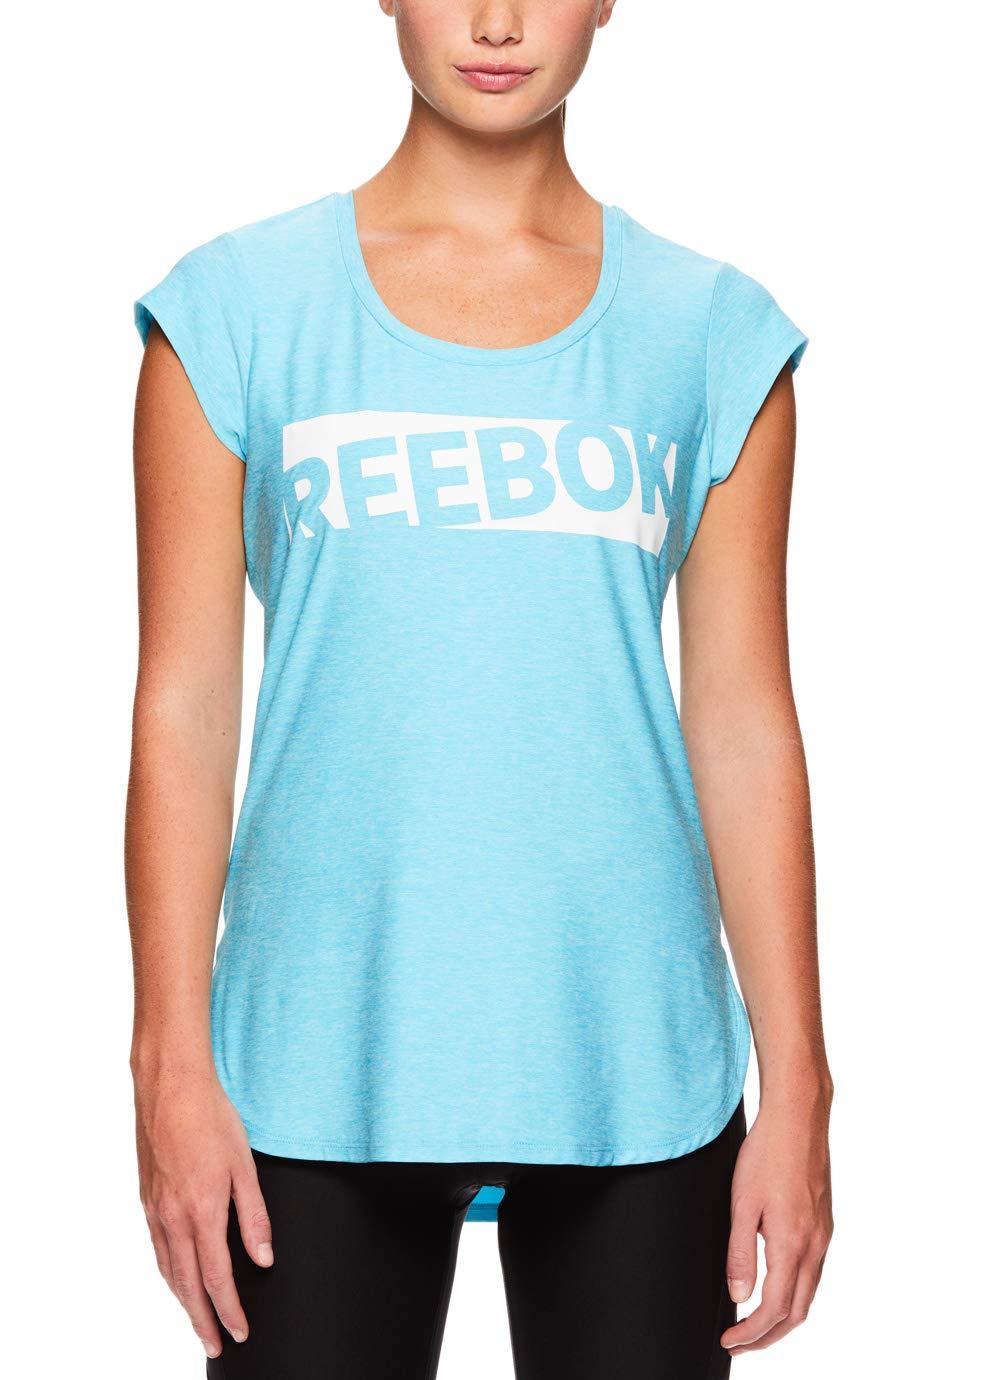 Reebok Women's Legend Performance Top Short Sleeve T-Shirt - Blue Atoll Heather, Extra Small by Reebok